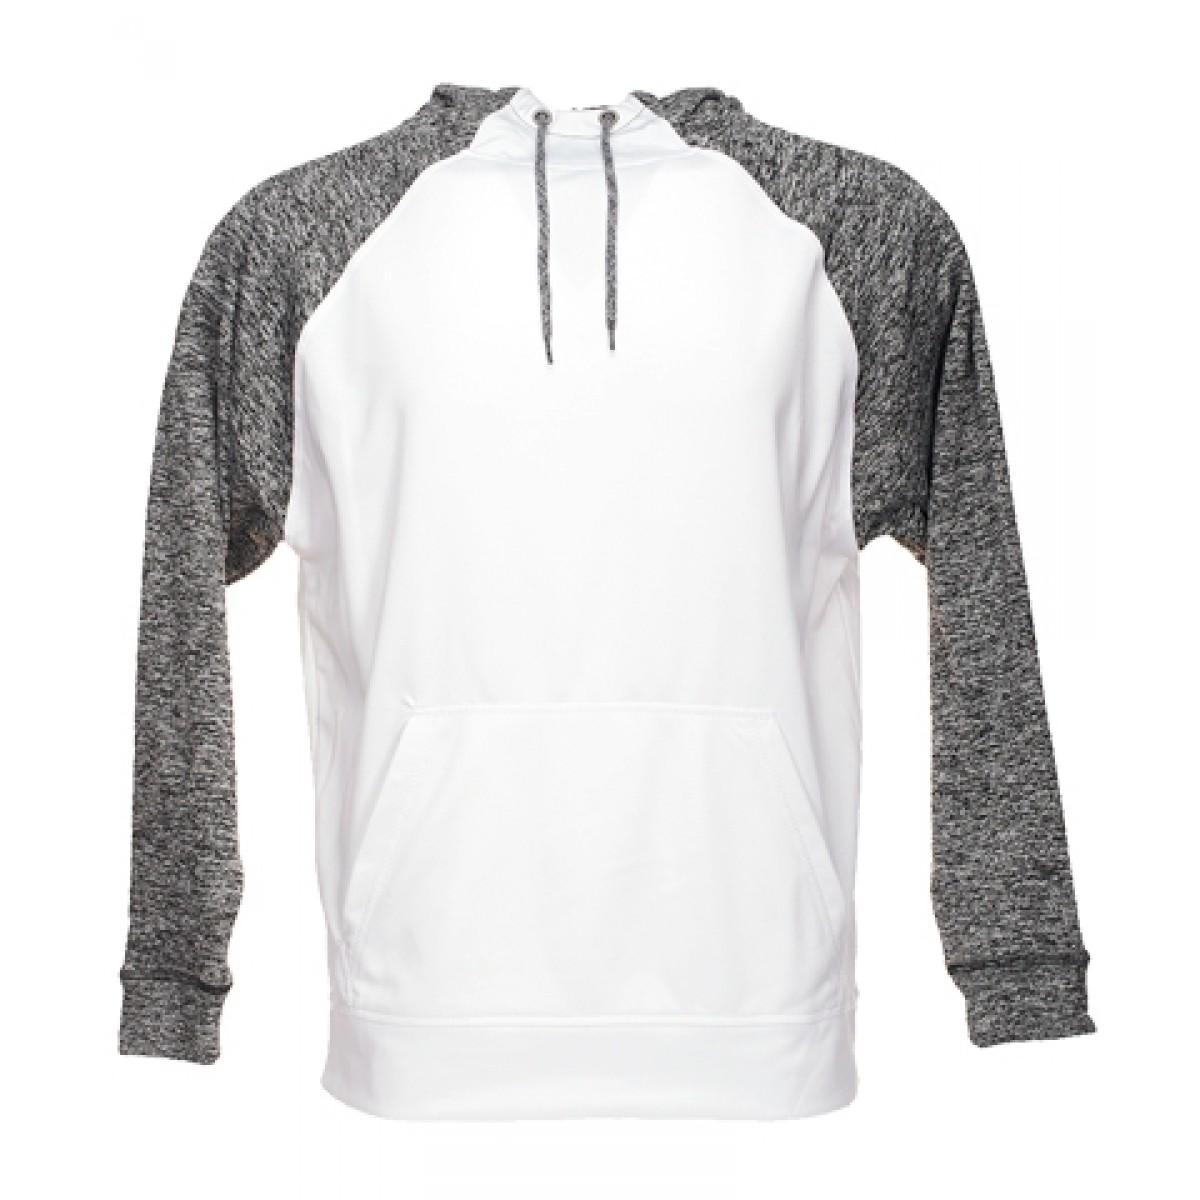 J America Cosmic Hooded Sweatshirt-White/Black-2XL